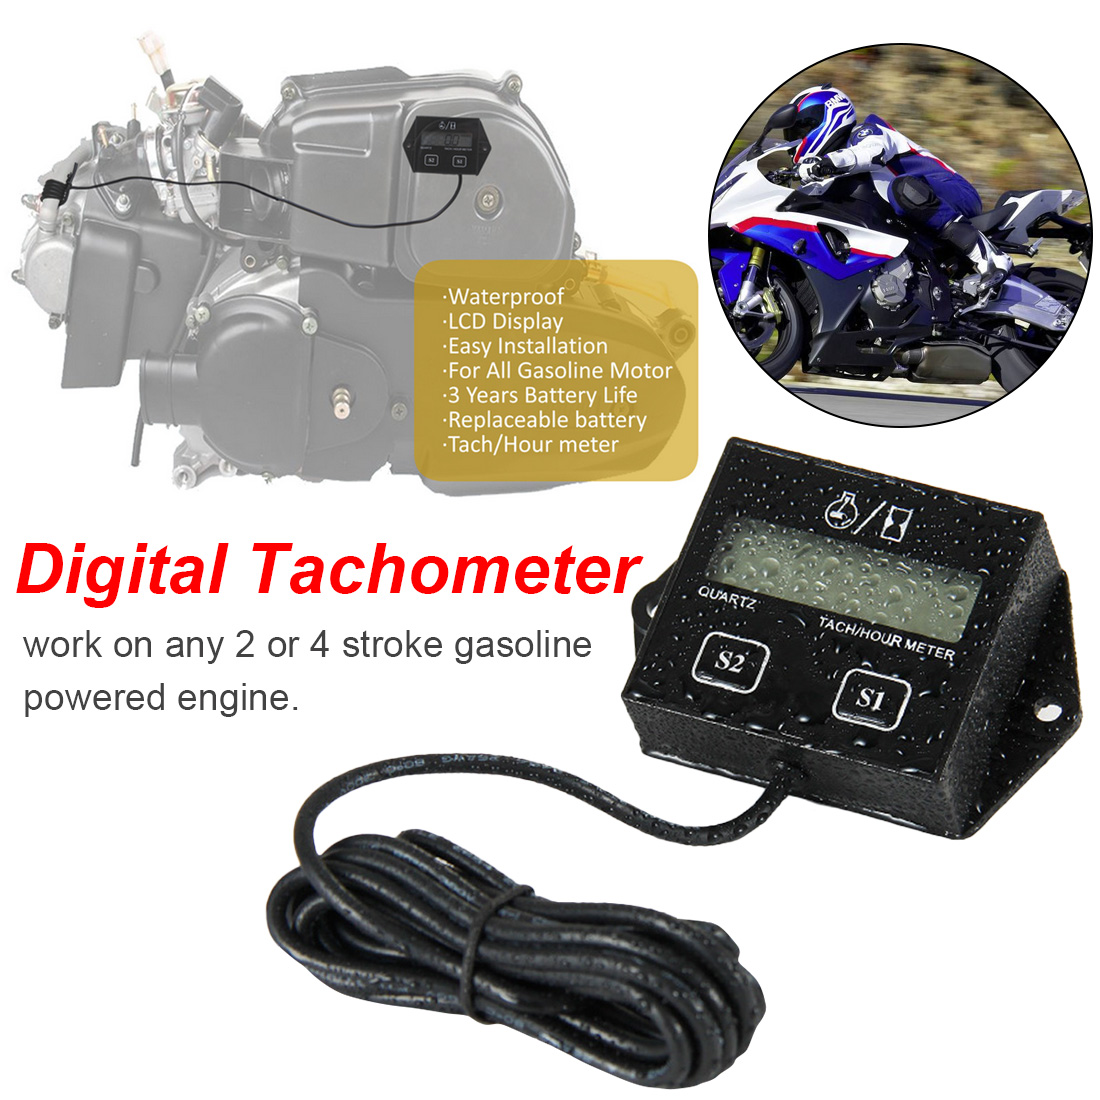 0 ~ 99,999 Rpm Motor Tach Stunde Meter Gauge Induktive Für Motorrad Motor Boot Auto Hub Motor Lcd Display Digital Drehzahlmesser